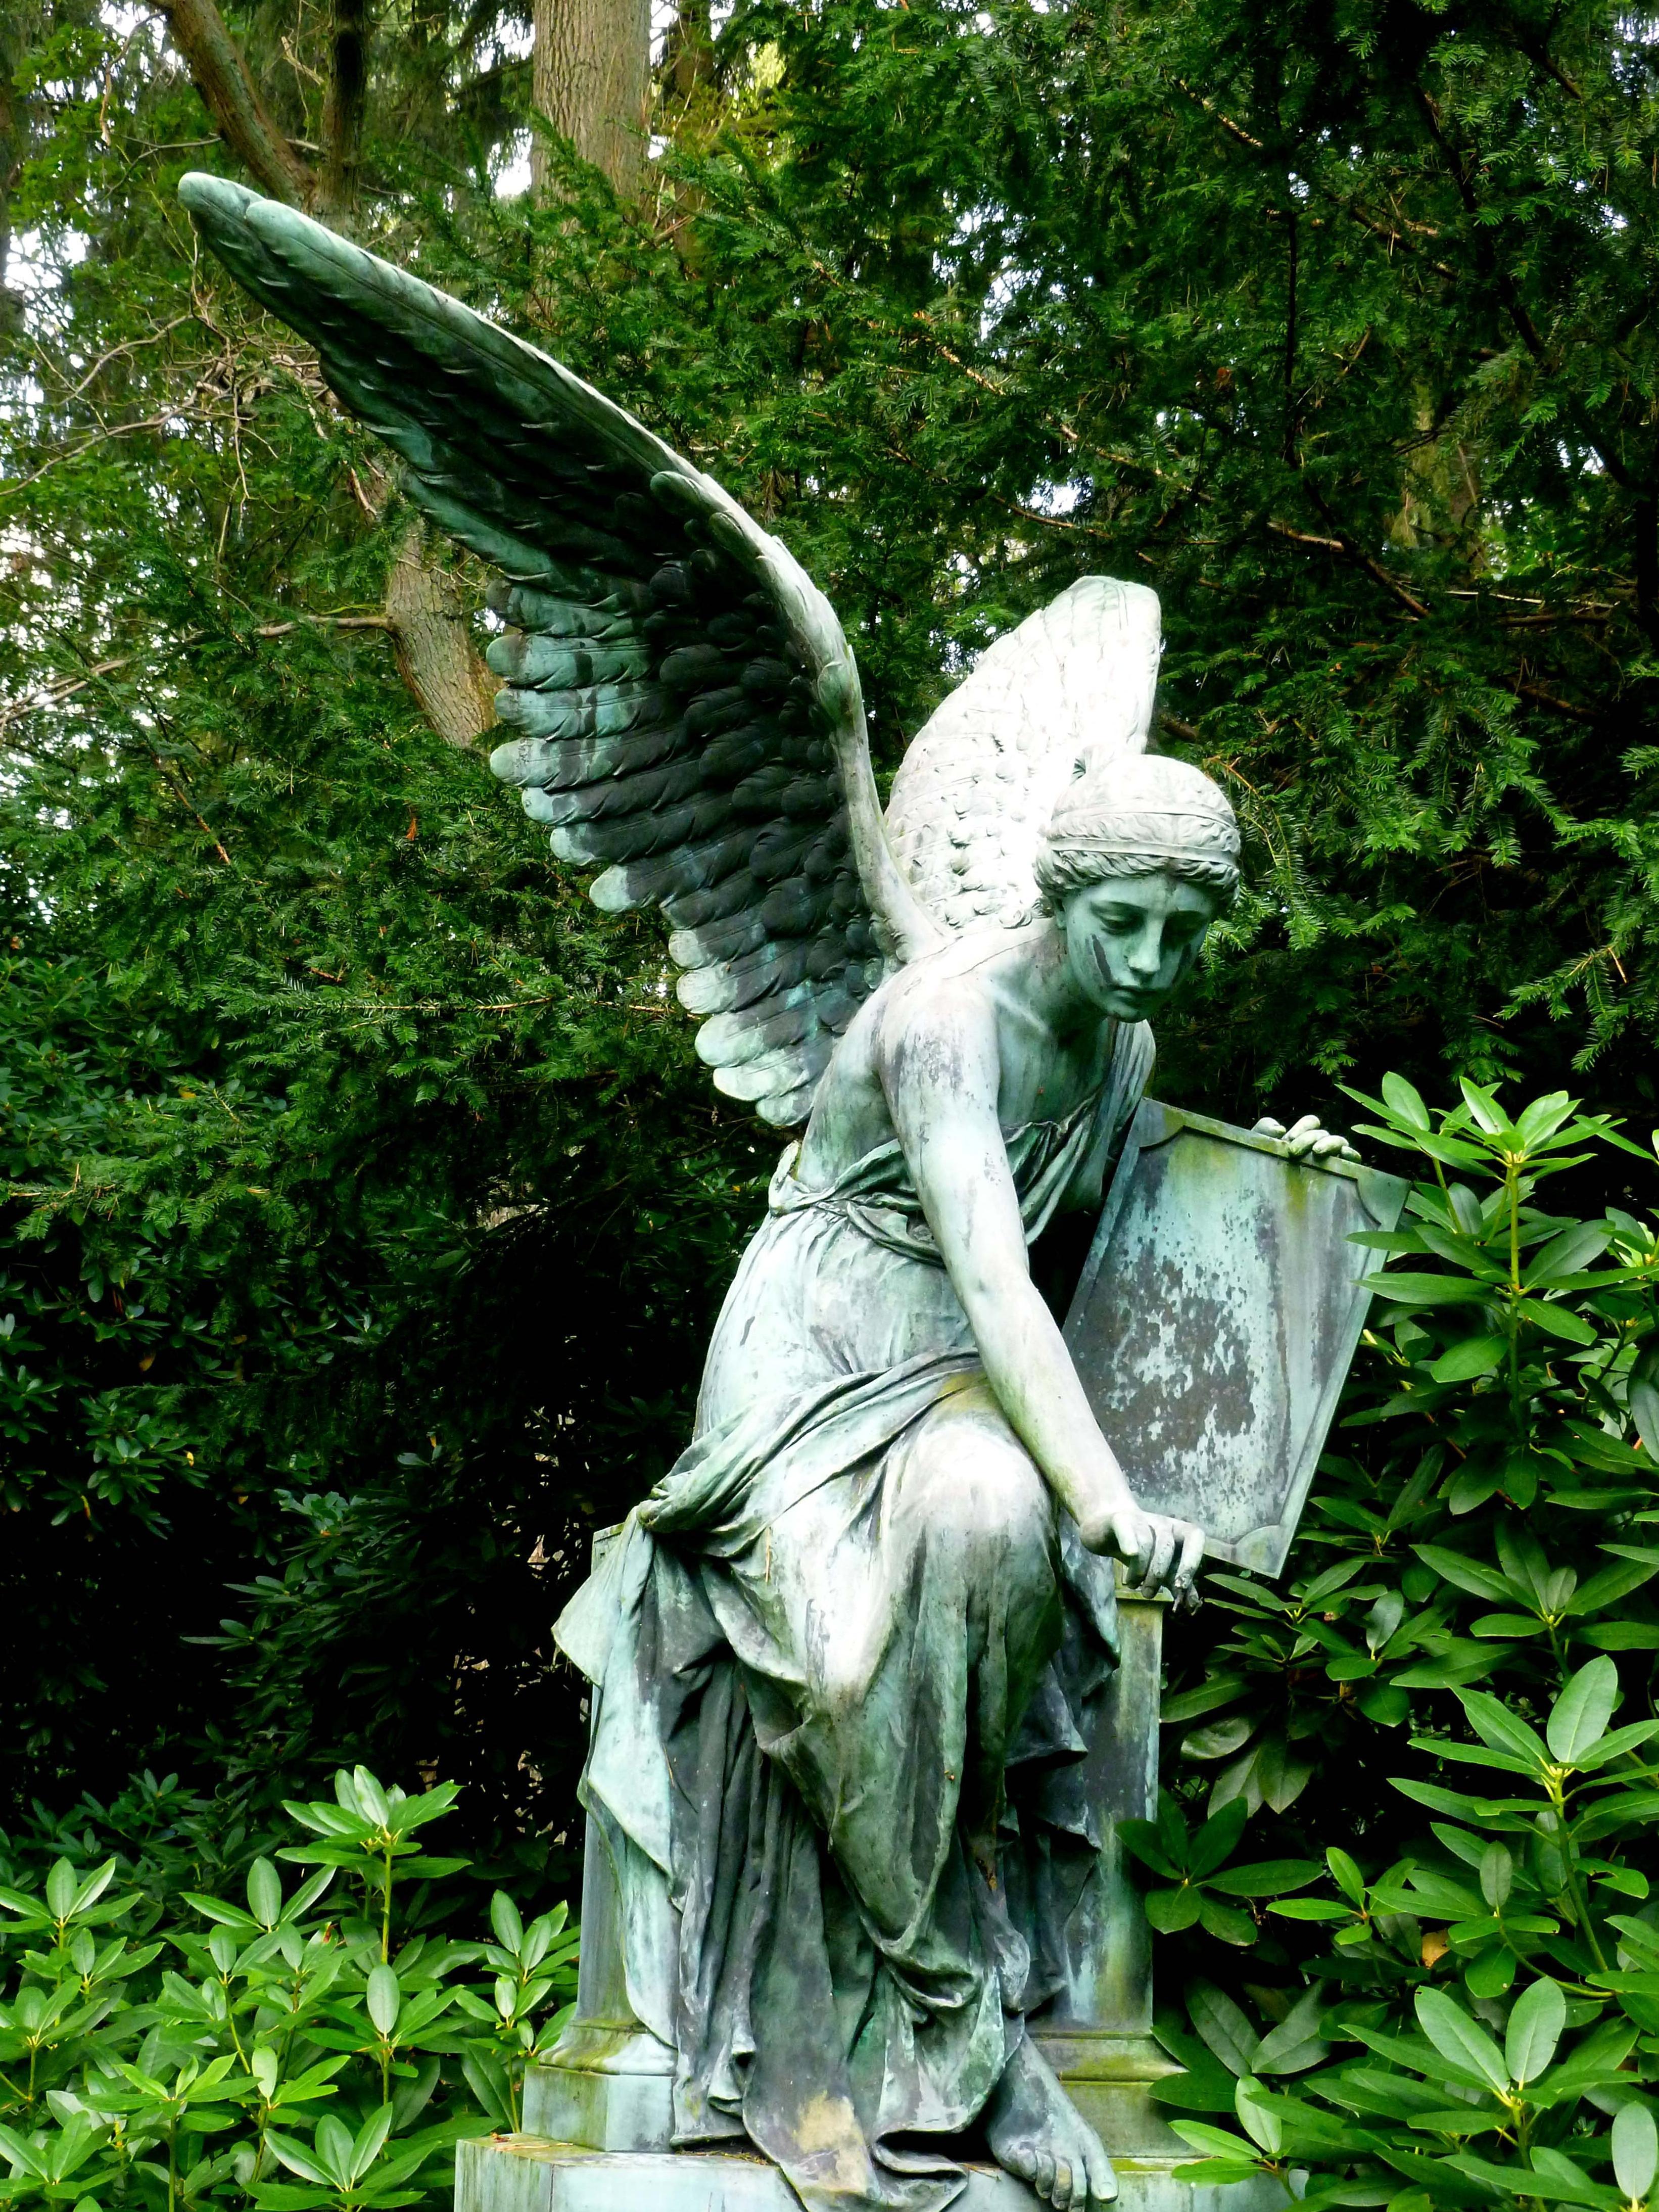 kostenlose bild statue skulptur kunst kraut baum pflanze engel marmor friedhof. Black Bedroom Furniture Sets. Home Design Ideas